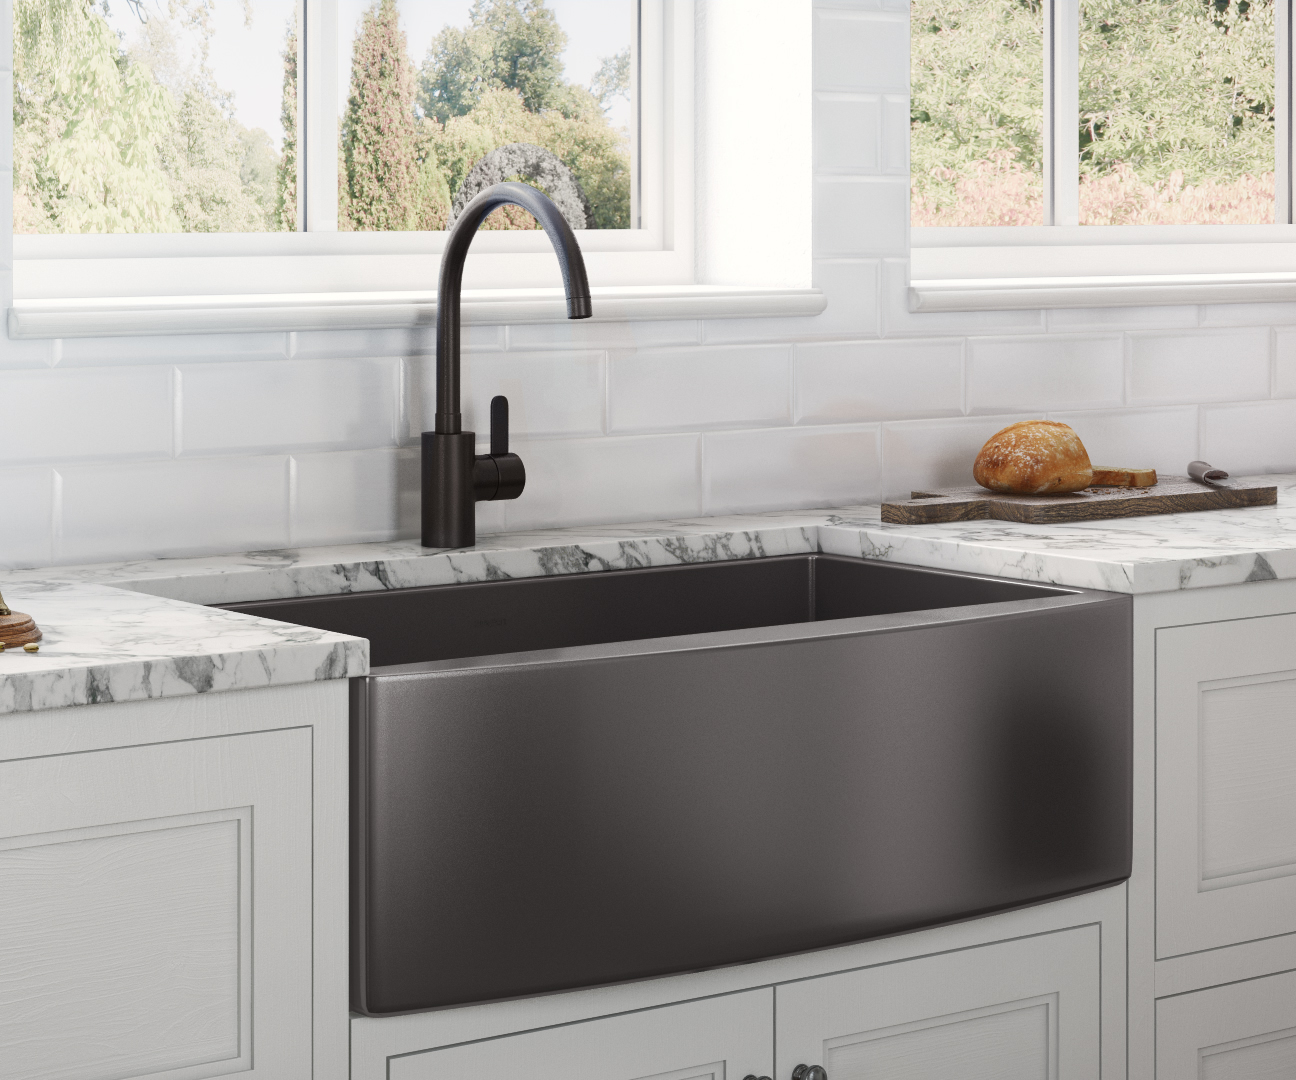 33-inch Apron-Front Farmhouse Kitchen Sink - Gunmetal ...